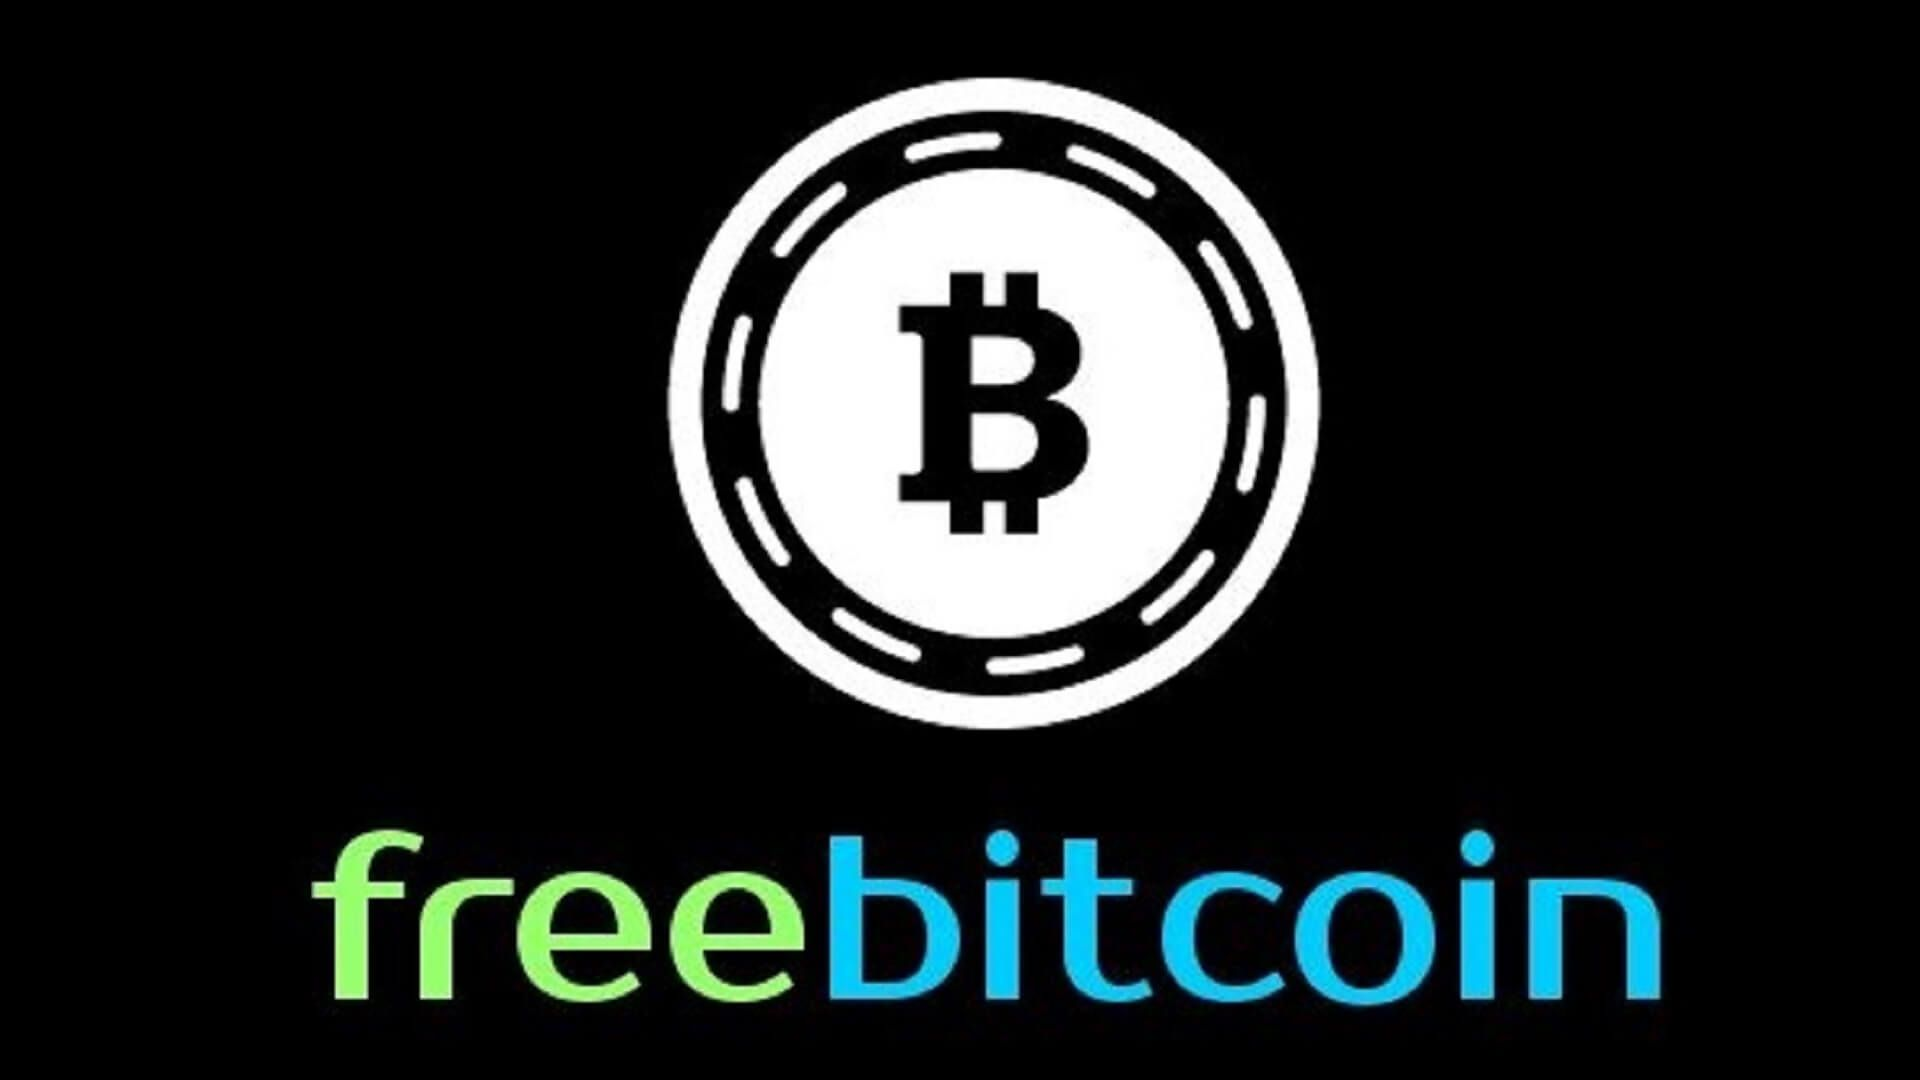 freebitcoin bot opțiuni roman stroganov